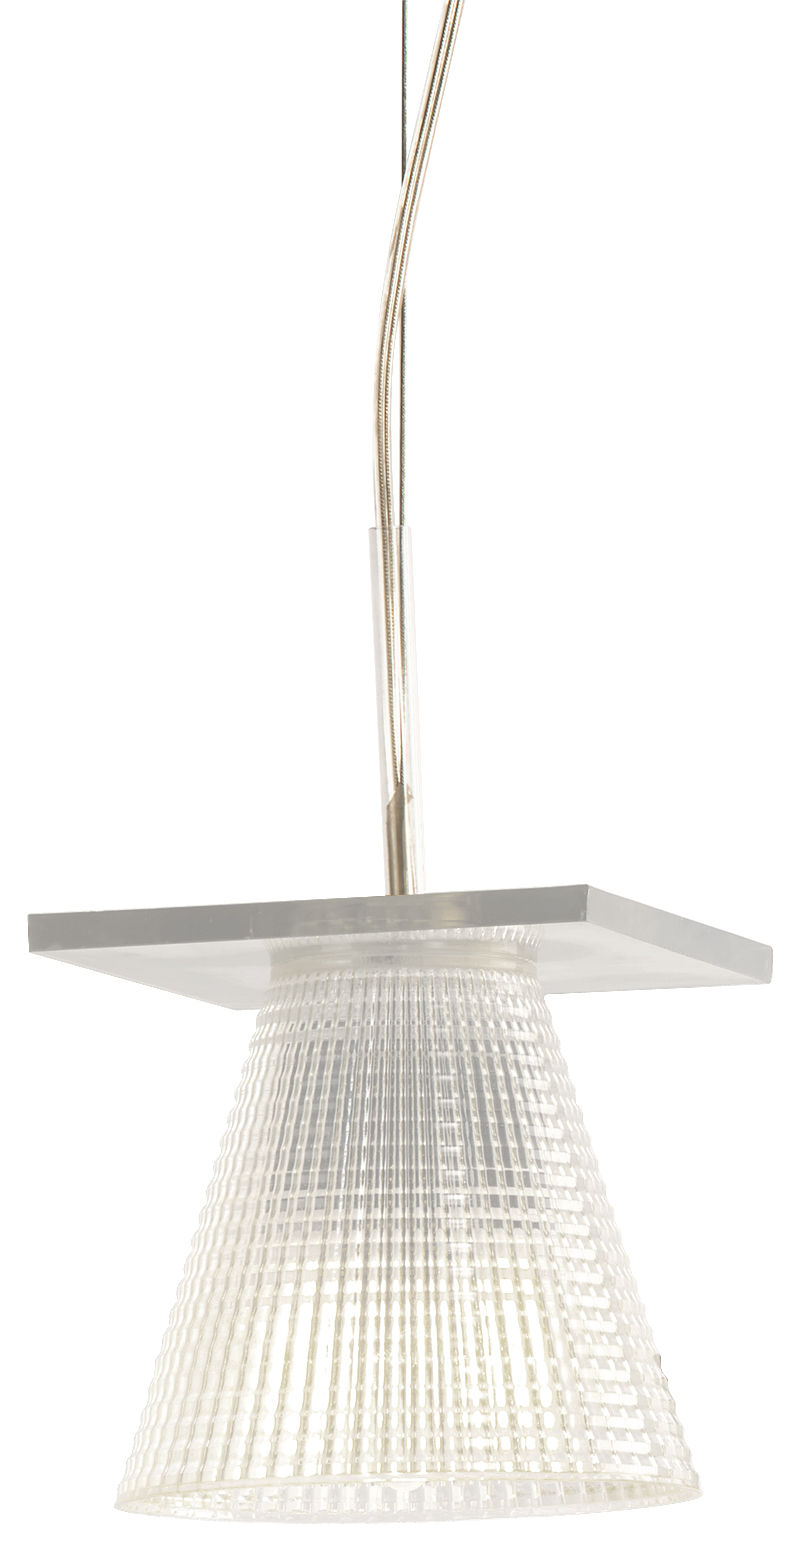 suspension light air abat jour plastique sculpt plastique cristal kartell. Black Bedroom Furniture Sets. Home Design Ideas